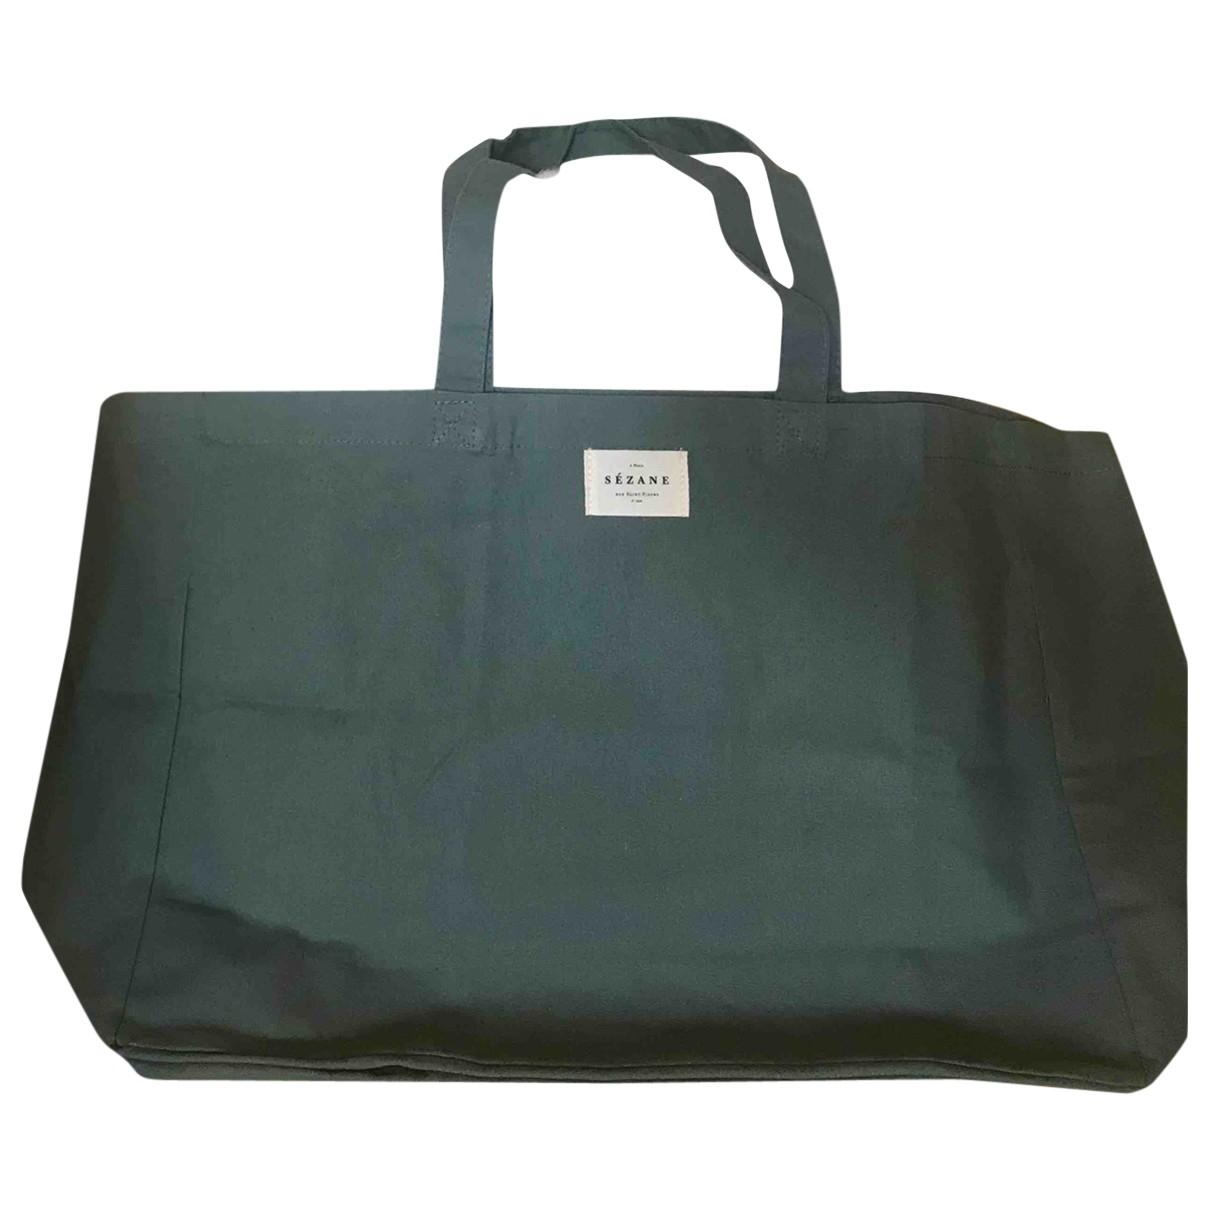 Sezane \N Handtasche in  Khaki Baumwolle